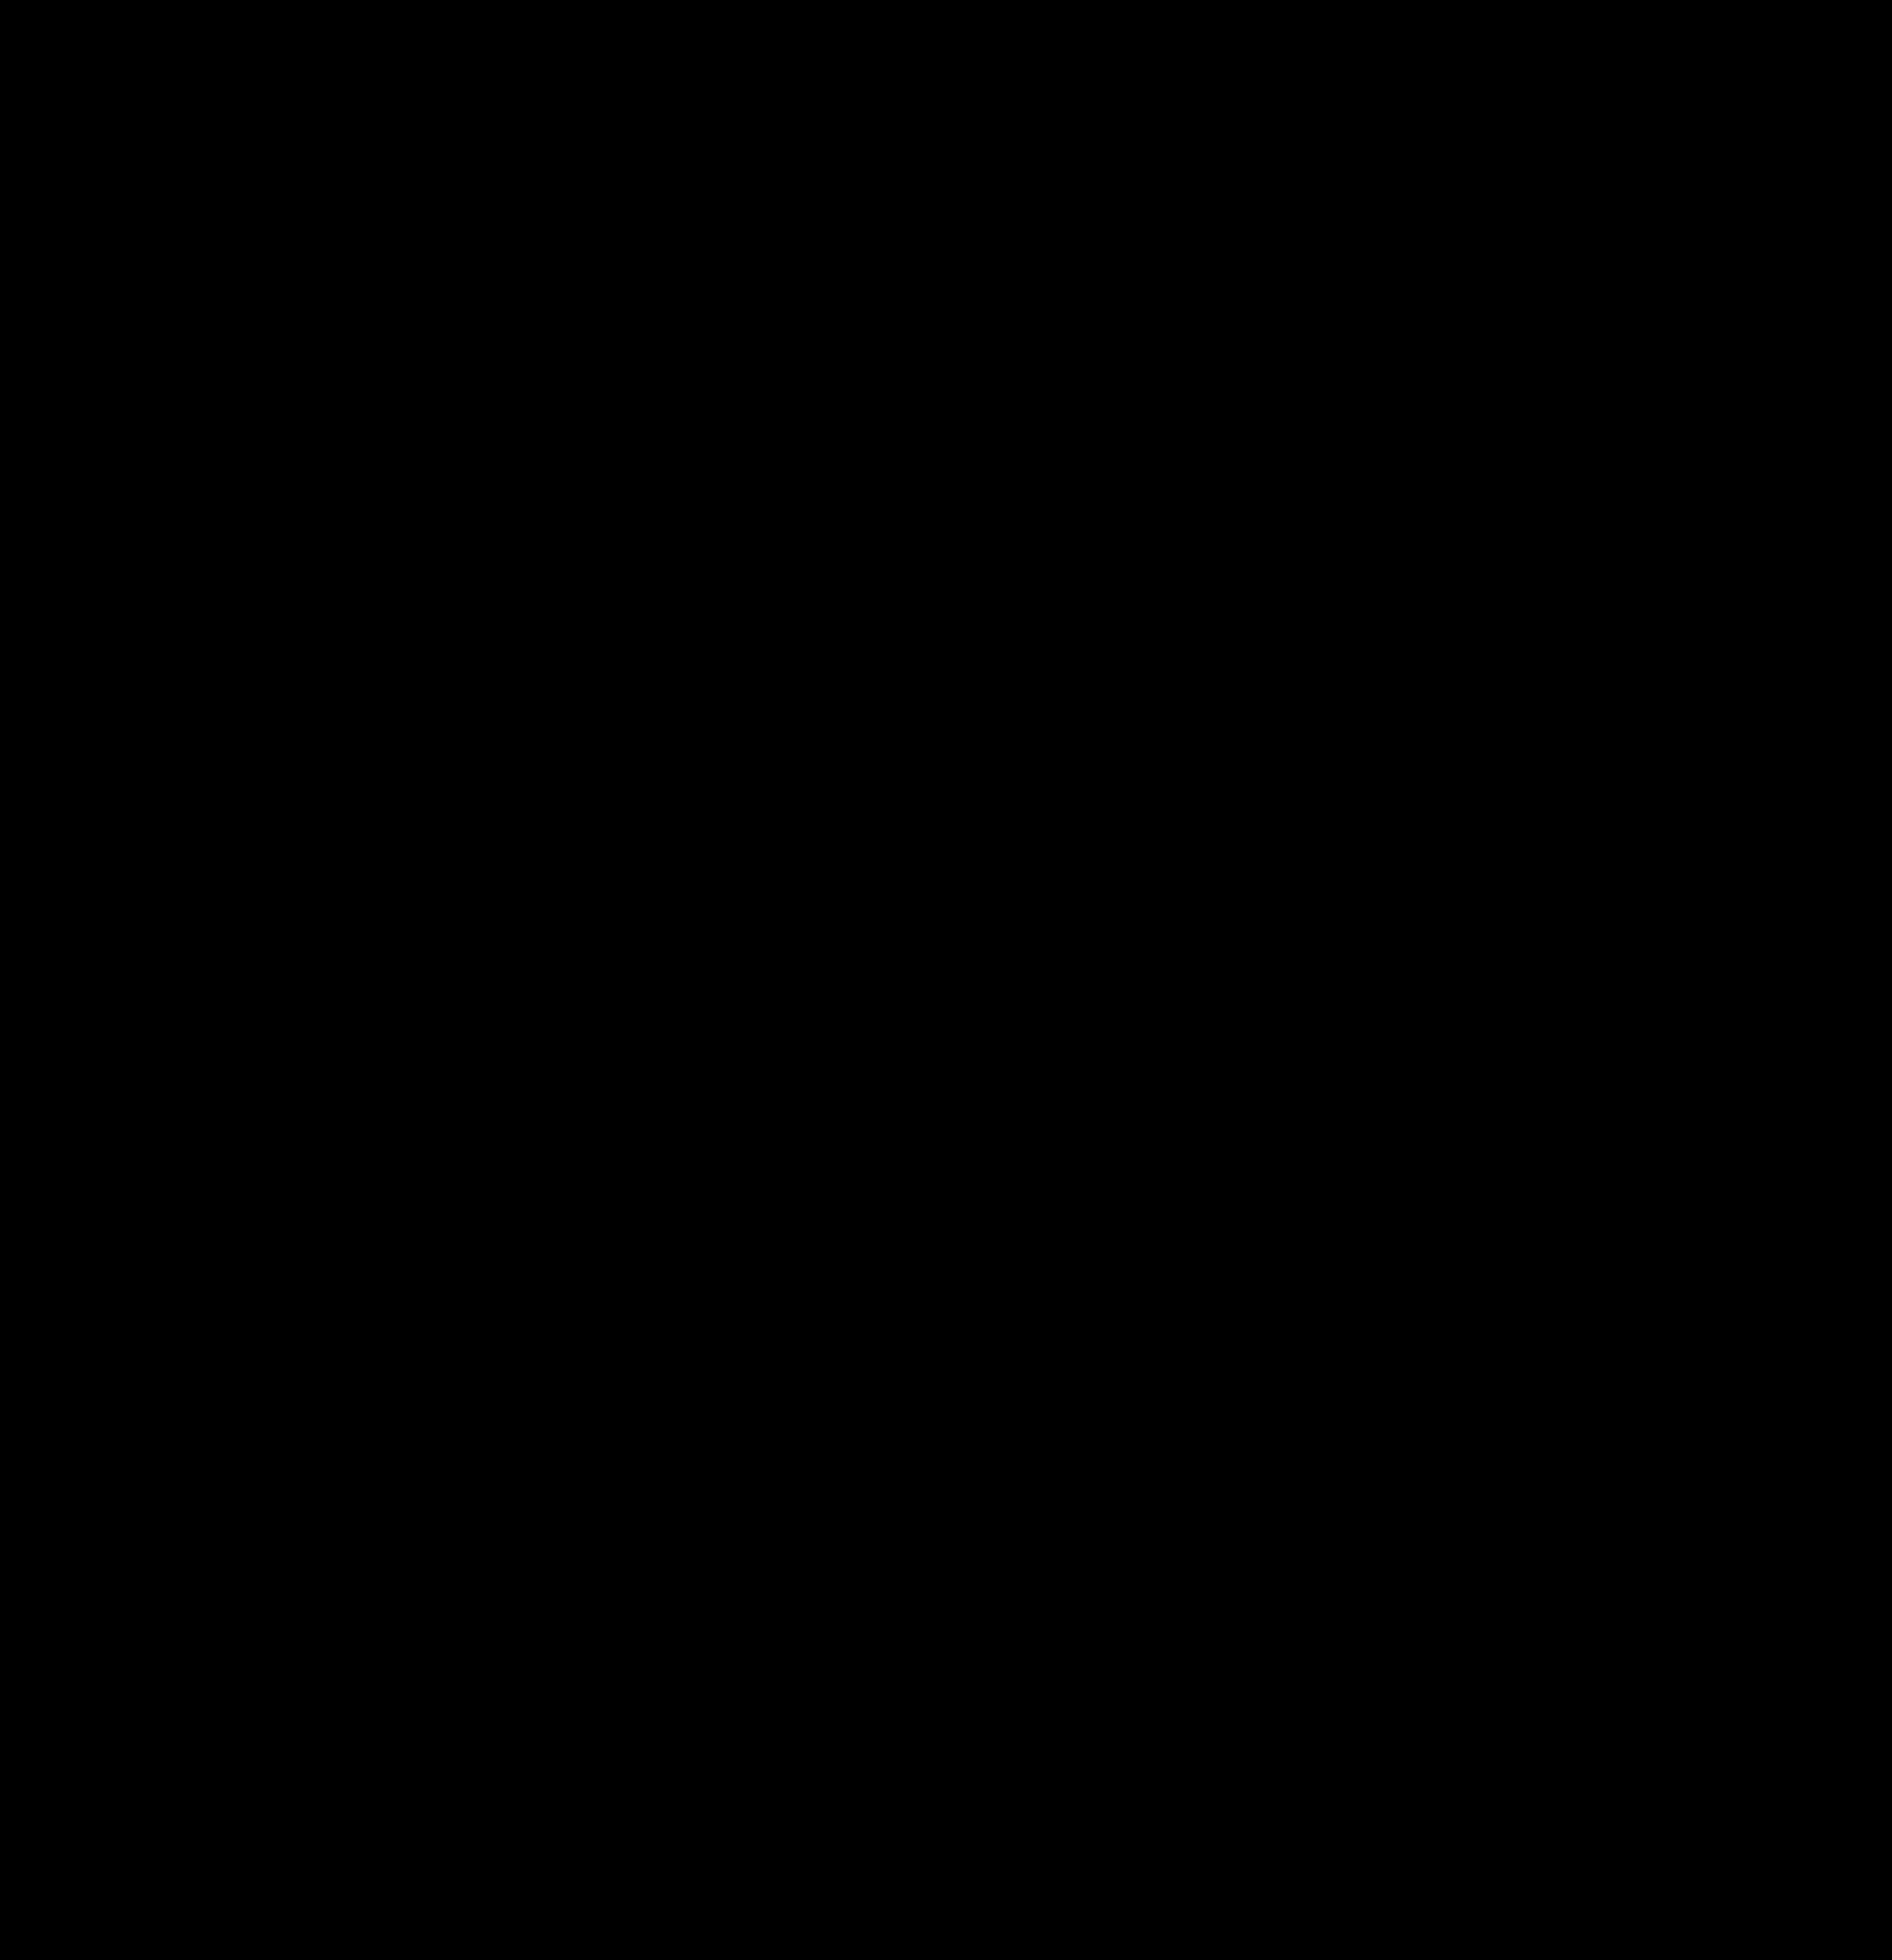 Flourish group leafy silhouette. Flourishes clipart logo